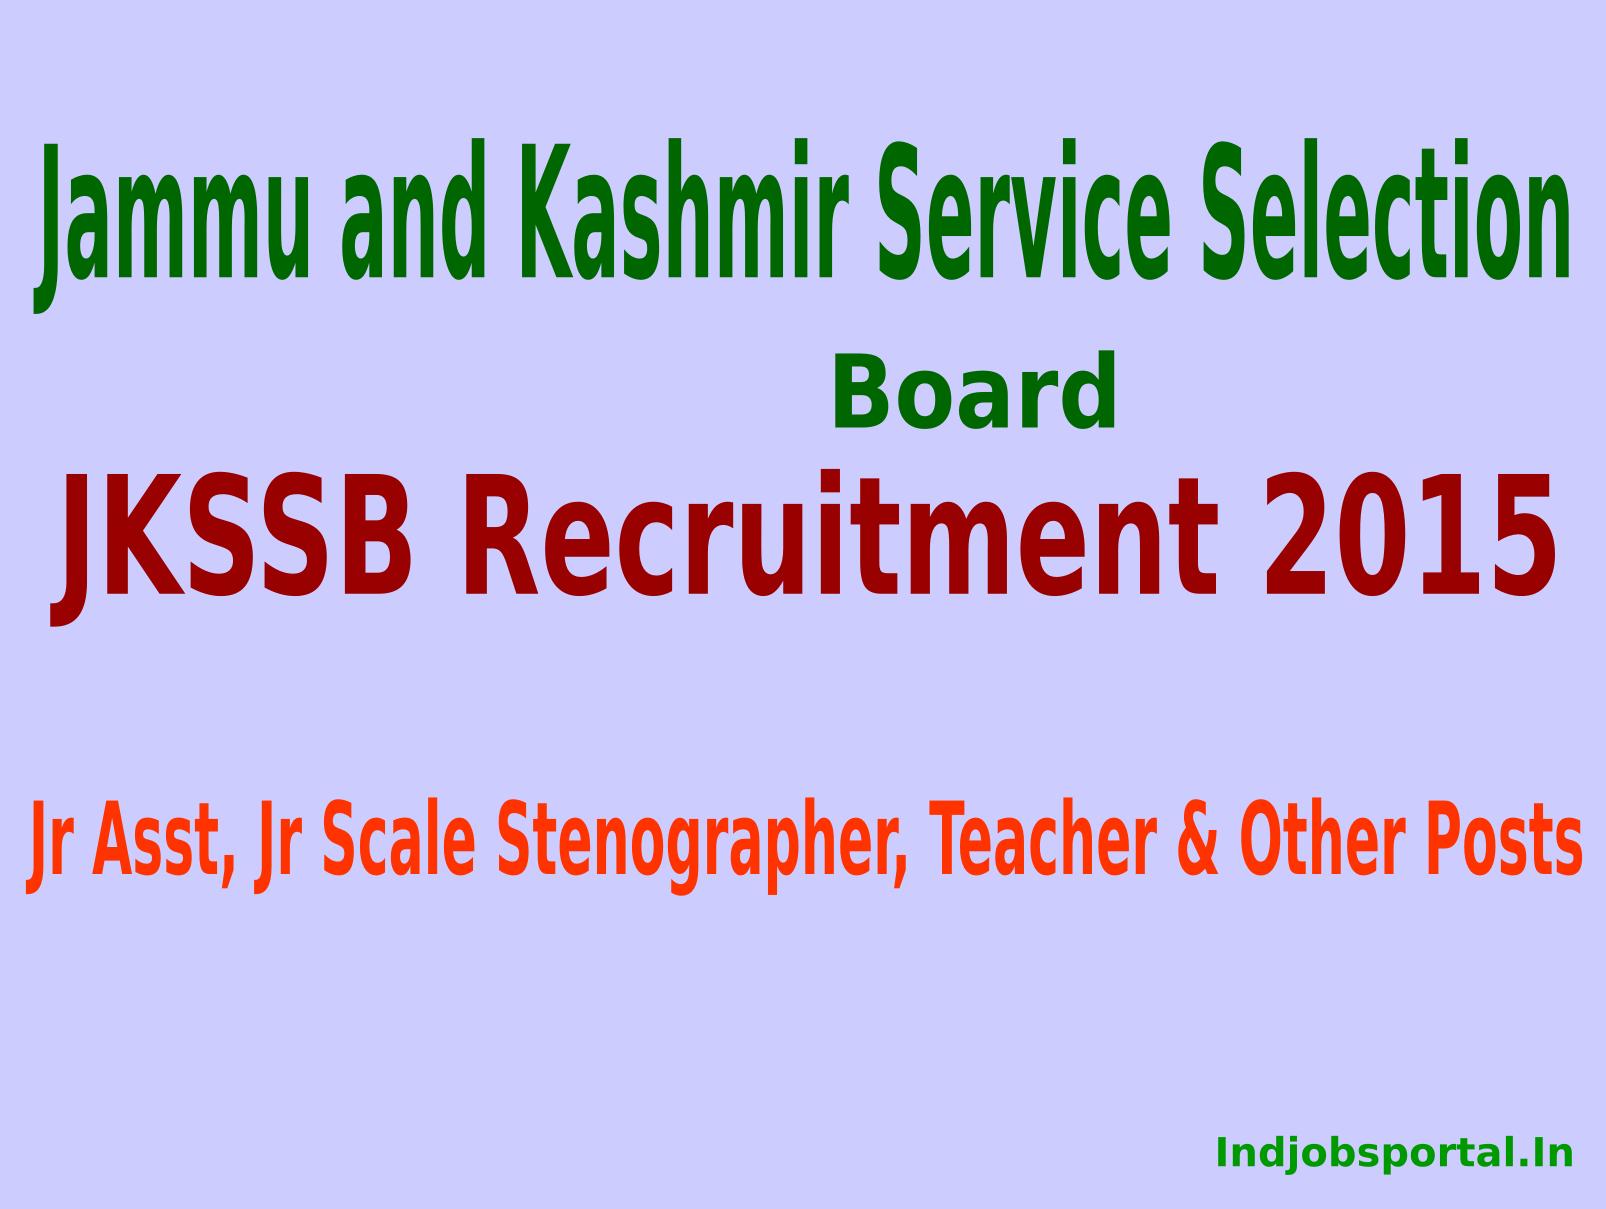 JKSSB Recruitment 2015 Apply Online For 665 Jr Asst, Jr Scale Stenographer, Teacher & Other Posts